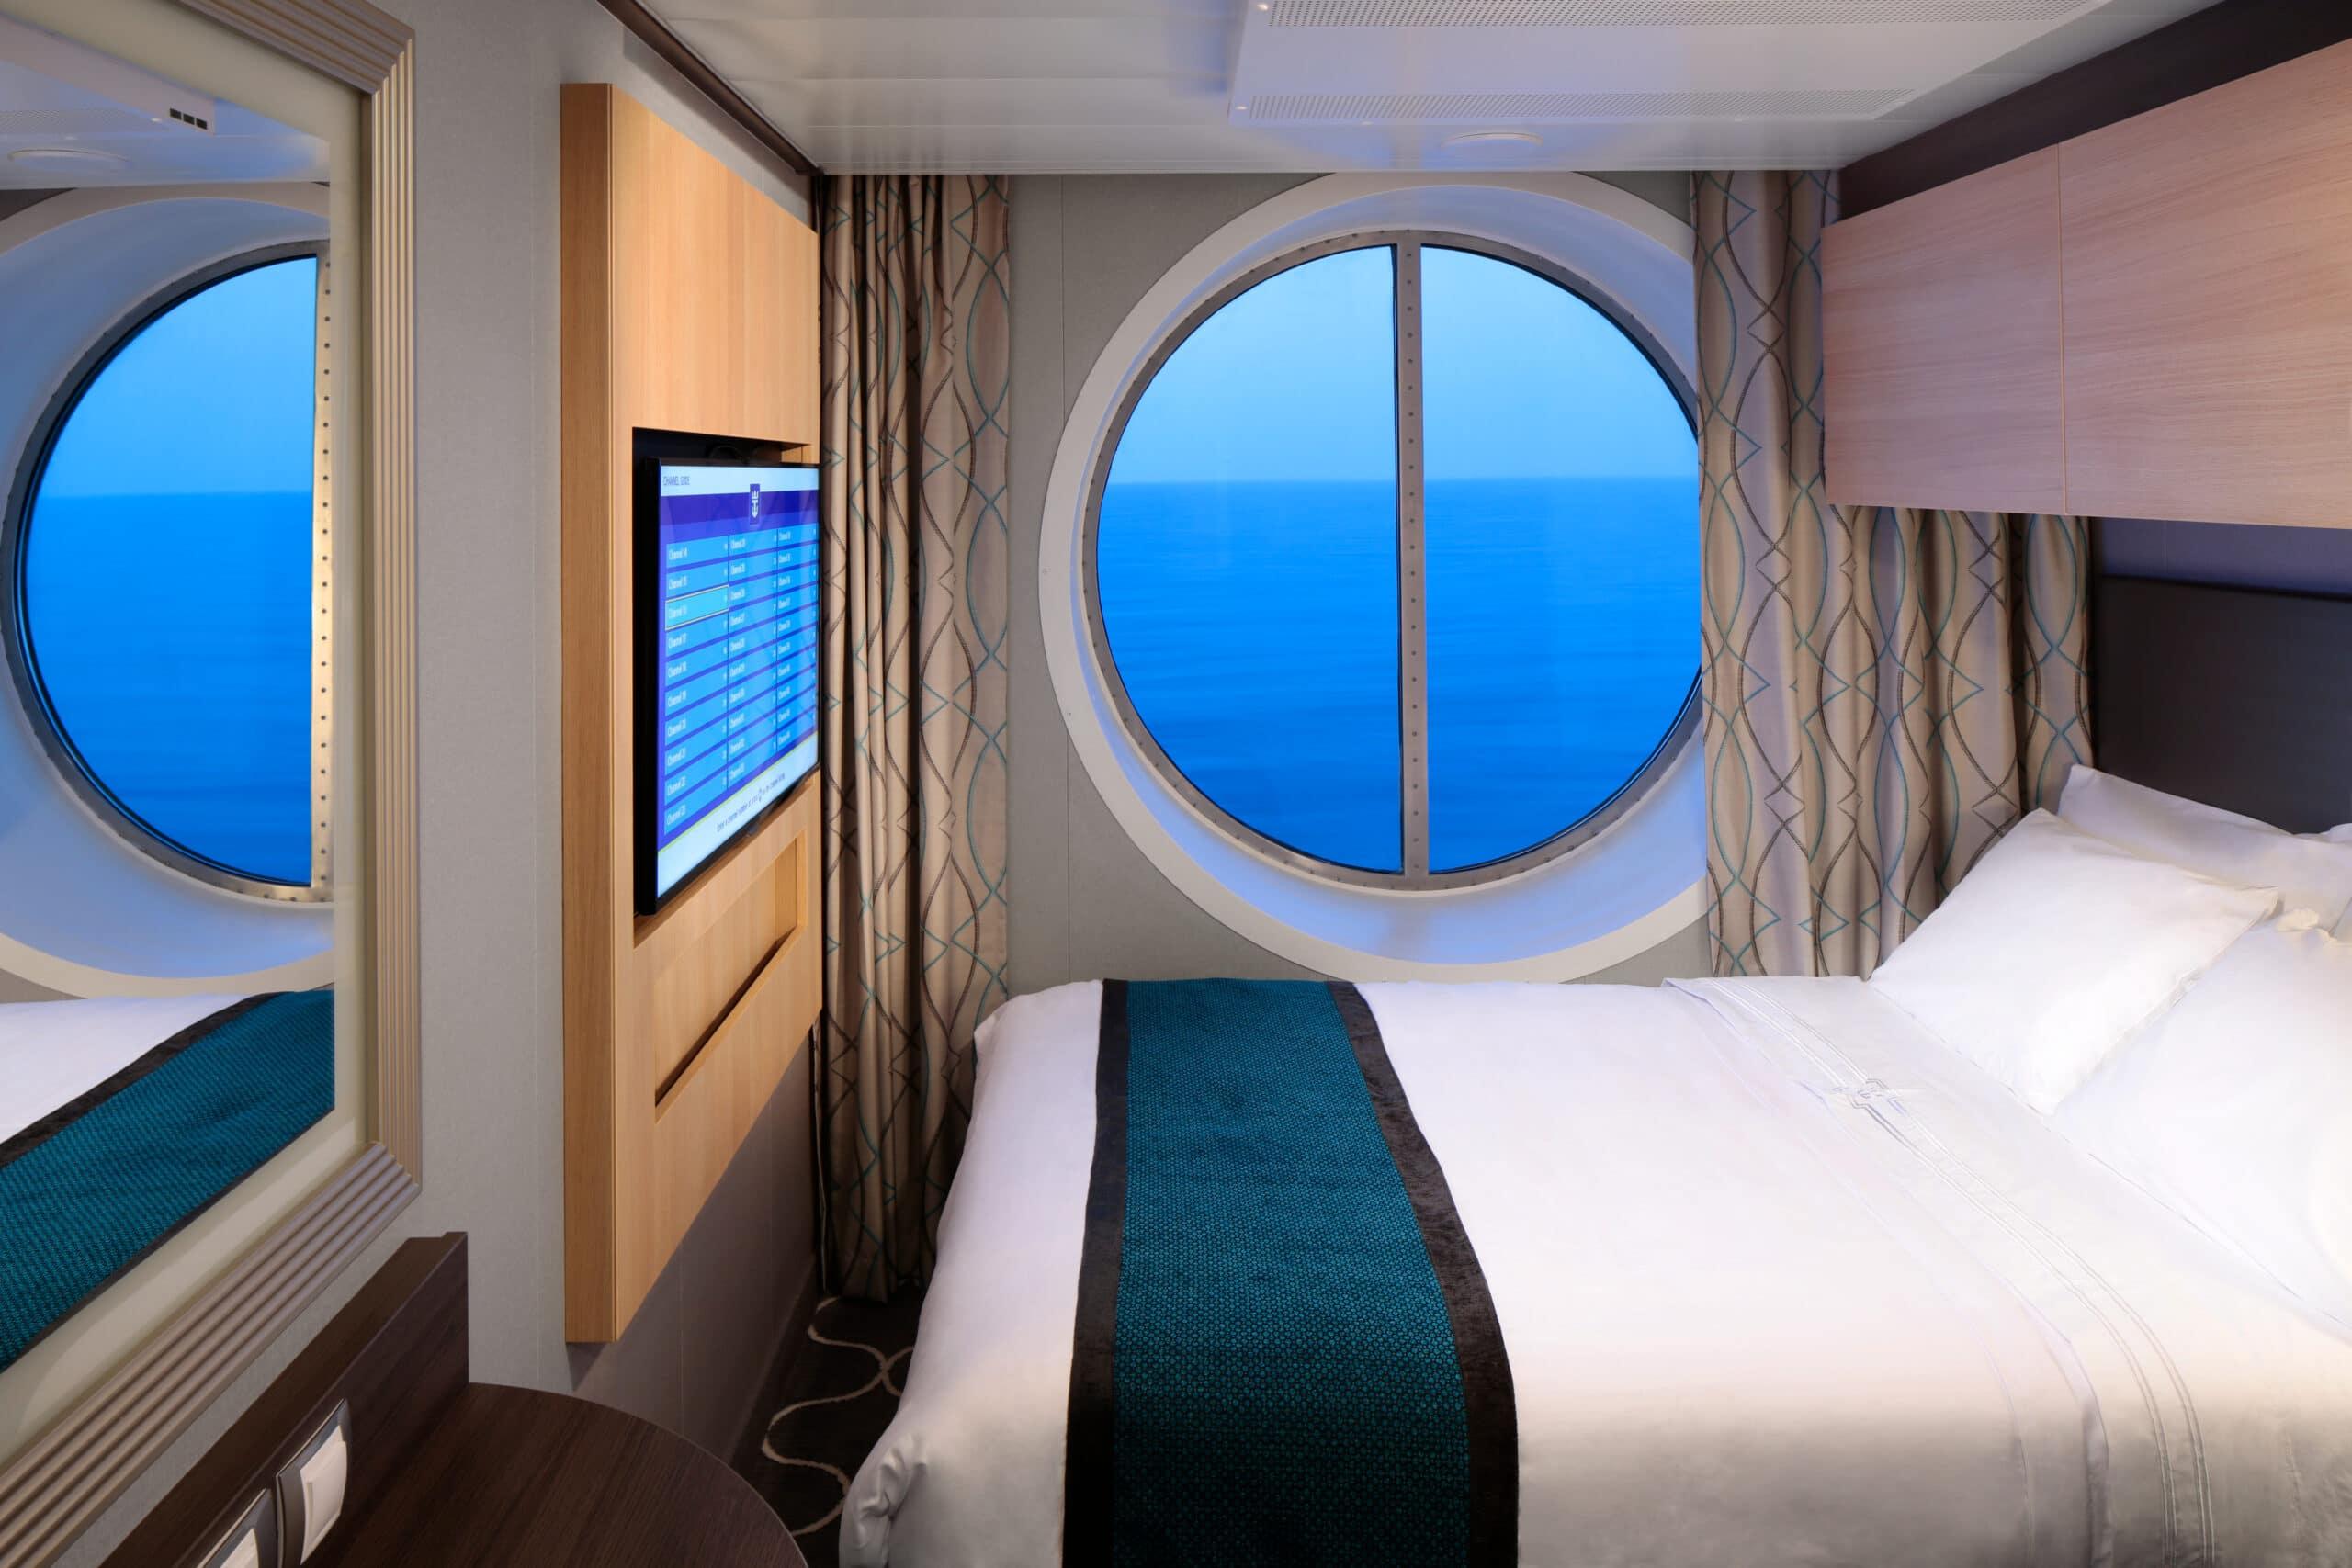 Royal-Caribbean-International-Harmony-of-the-Seas-Symphony-of-the-seas-schip-cruiseschip-categorie-2O-2N-Studio-buitenhut